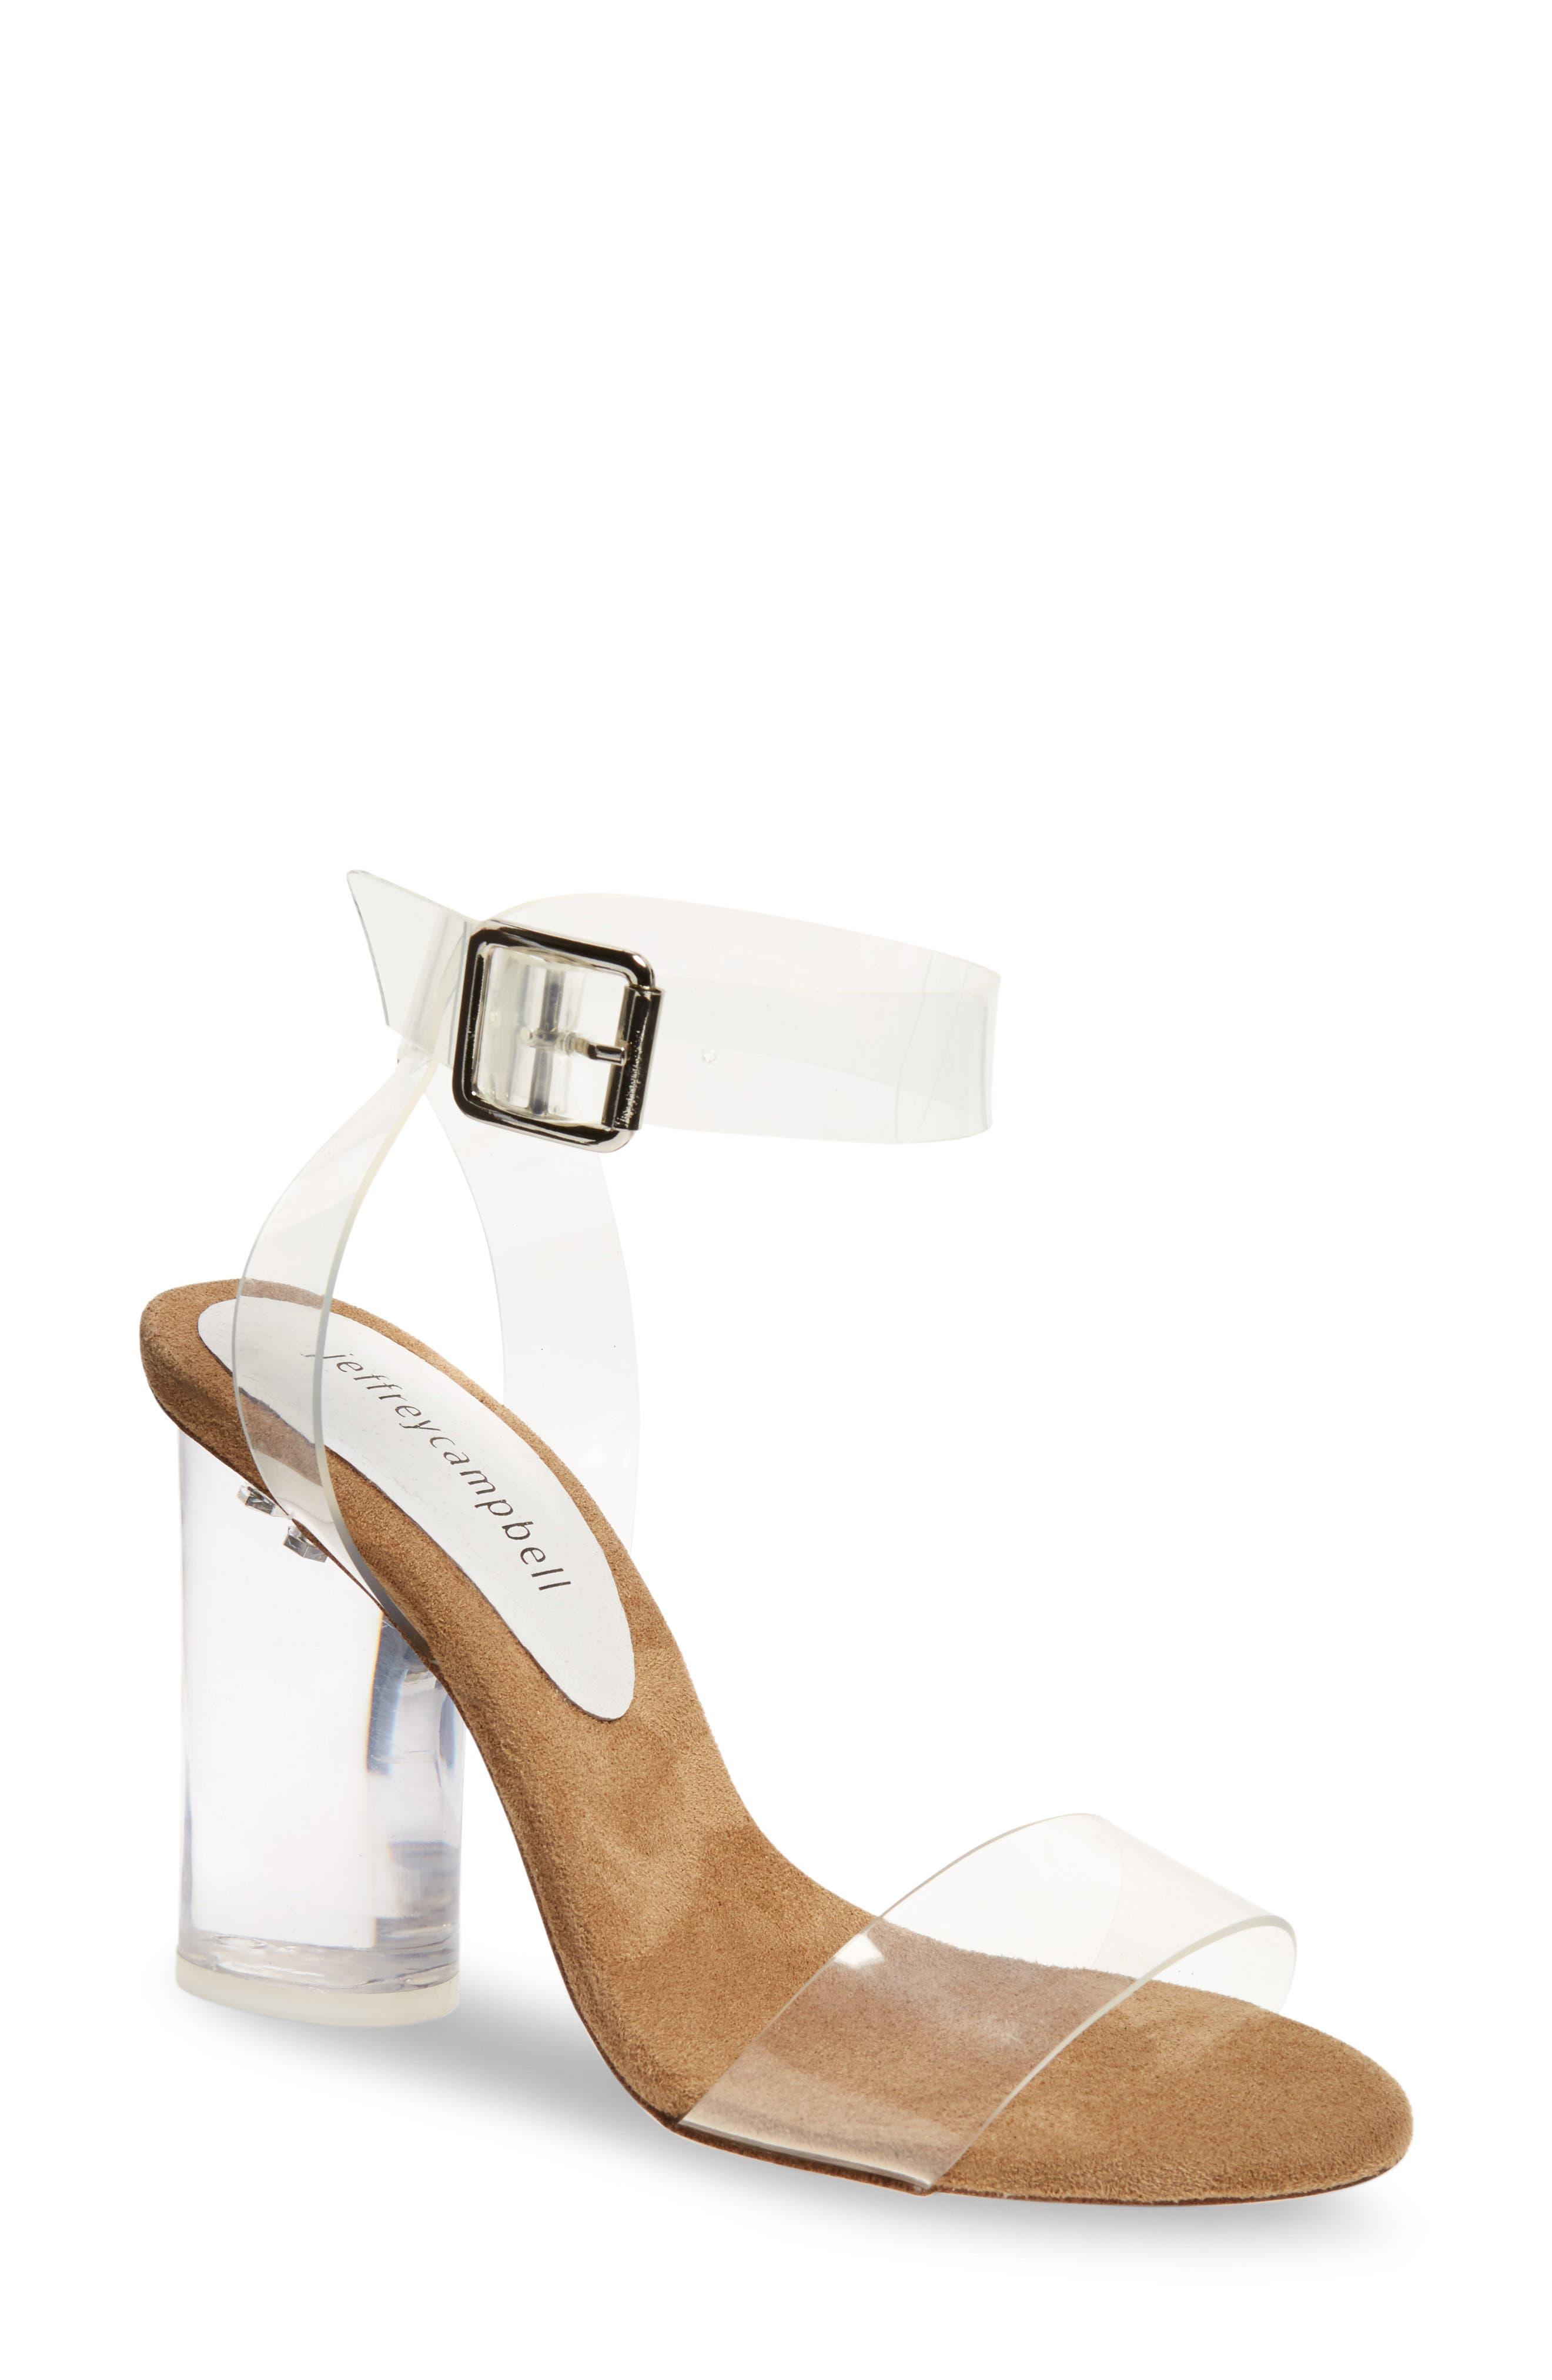 Main Image - Jeffrey Campbell Clear Heel Sandal (Women)